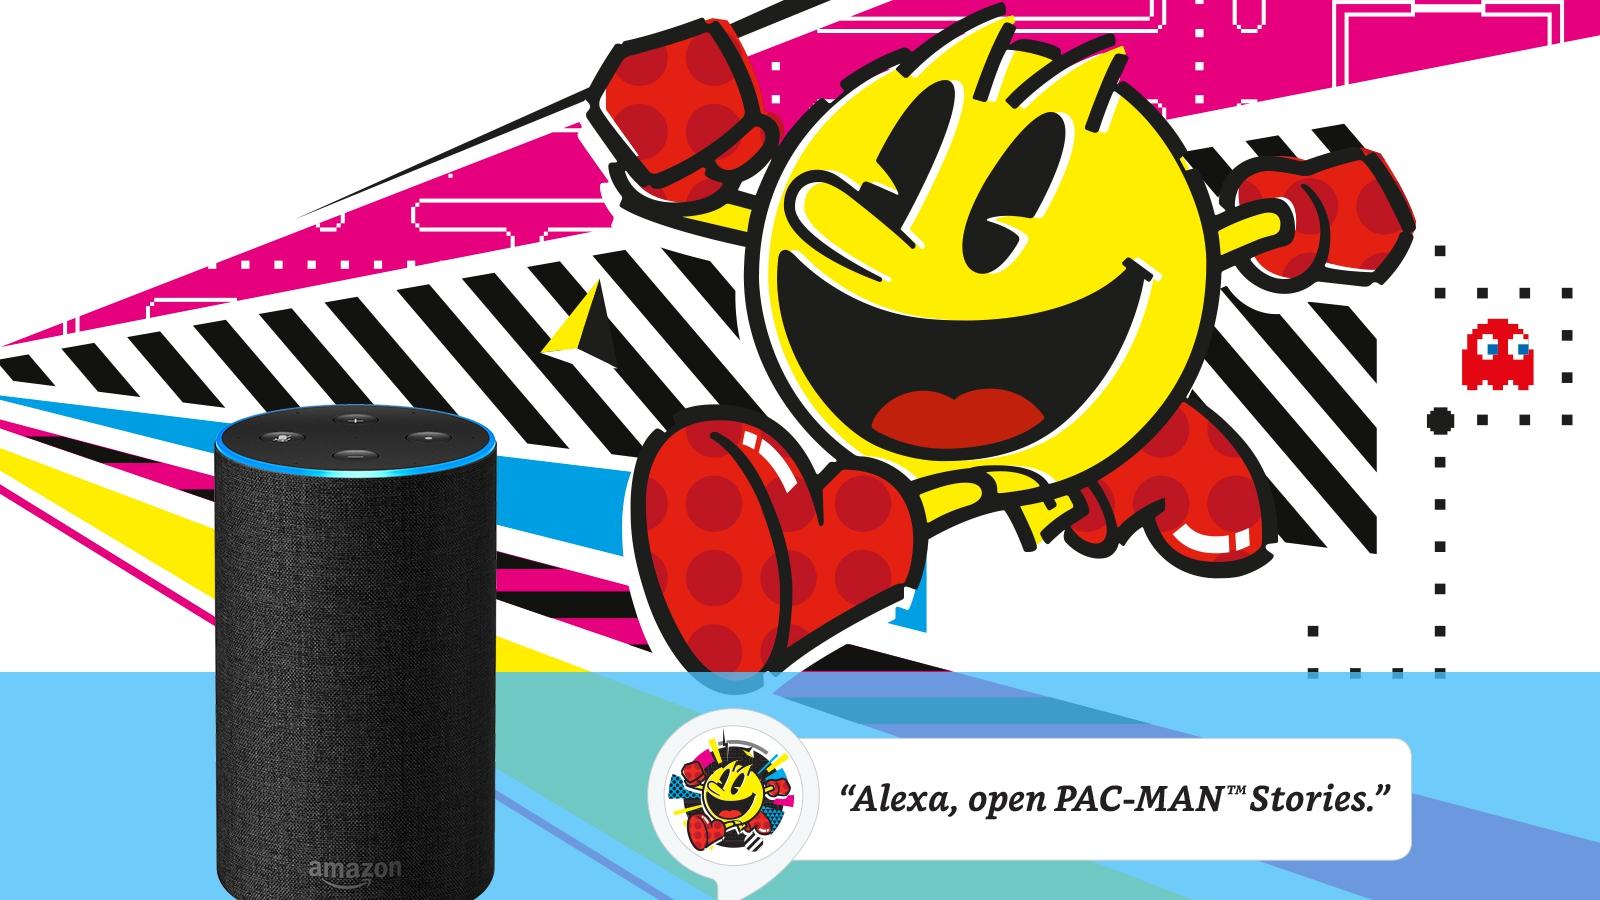 Pac-Man Stories, una nuova avventura interattiva per Amazon Alexa thumbnail